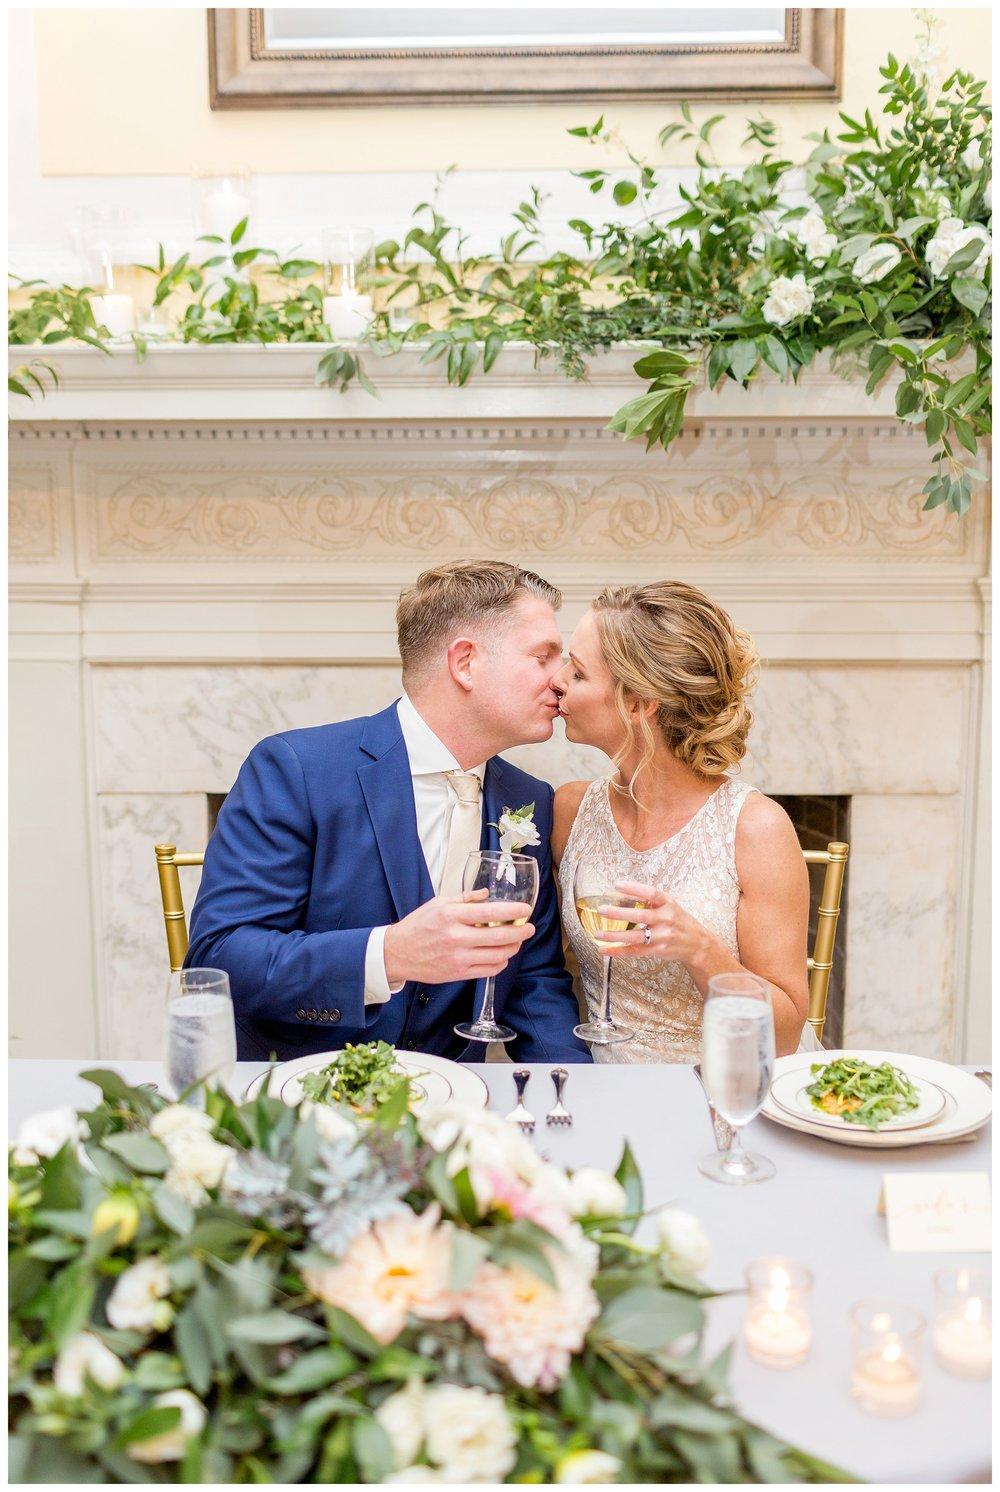 Meridian Hill Park Wedding | Washington DC Wedding Photographer Kir Tuben_0101.jpg